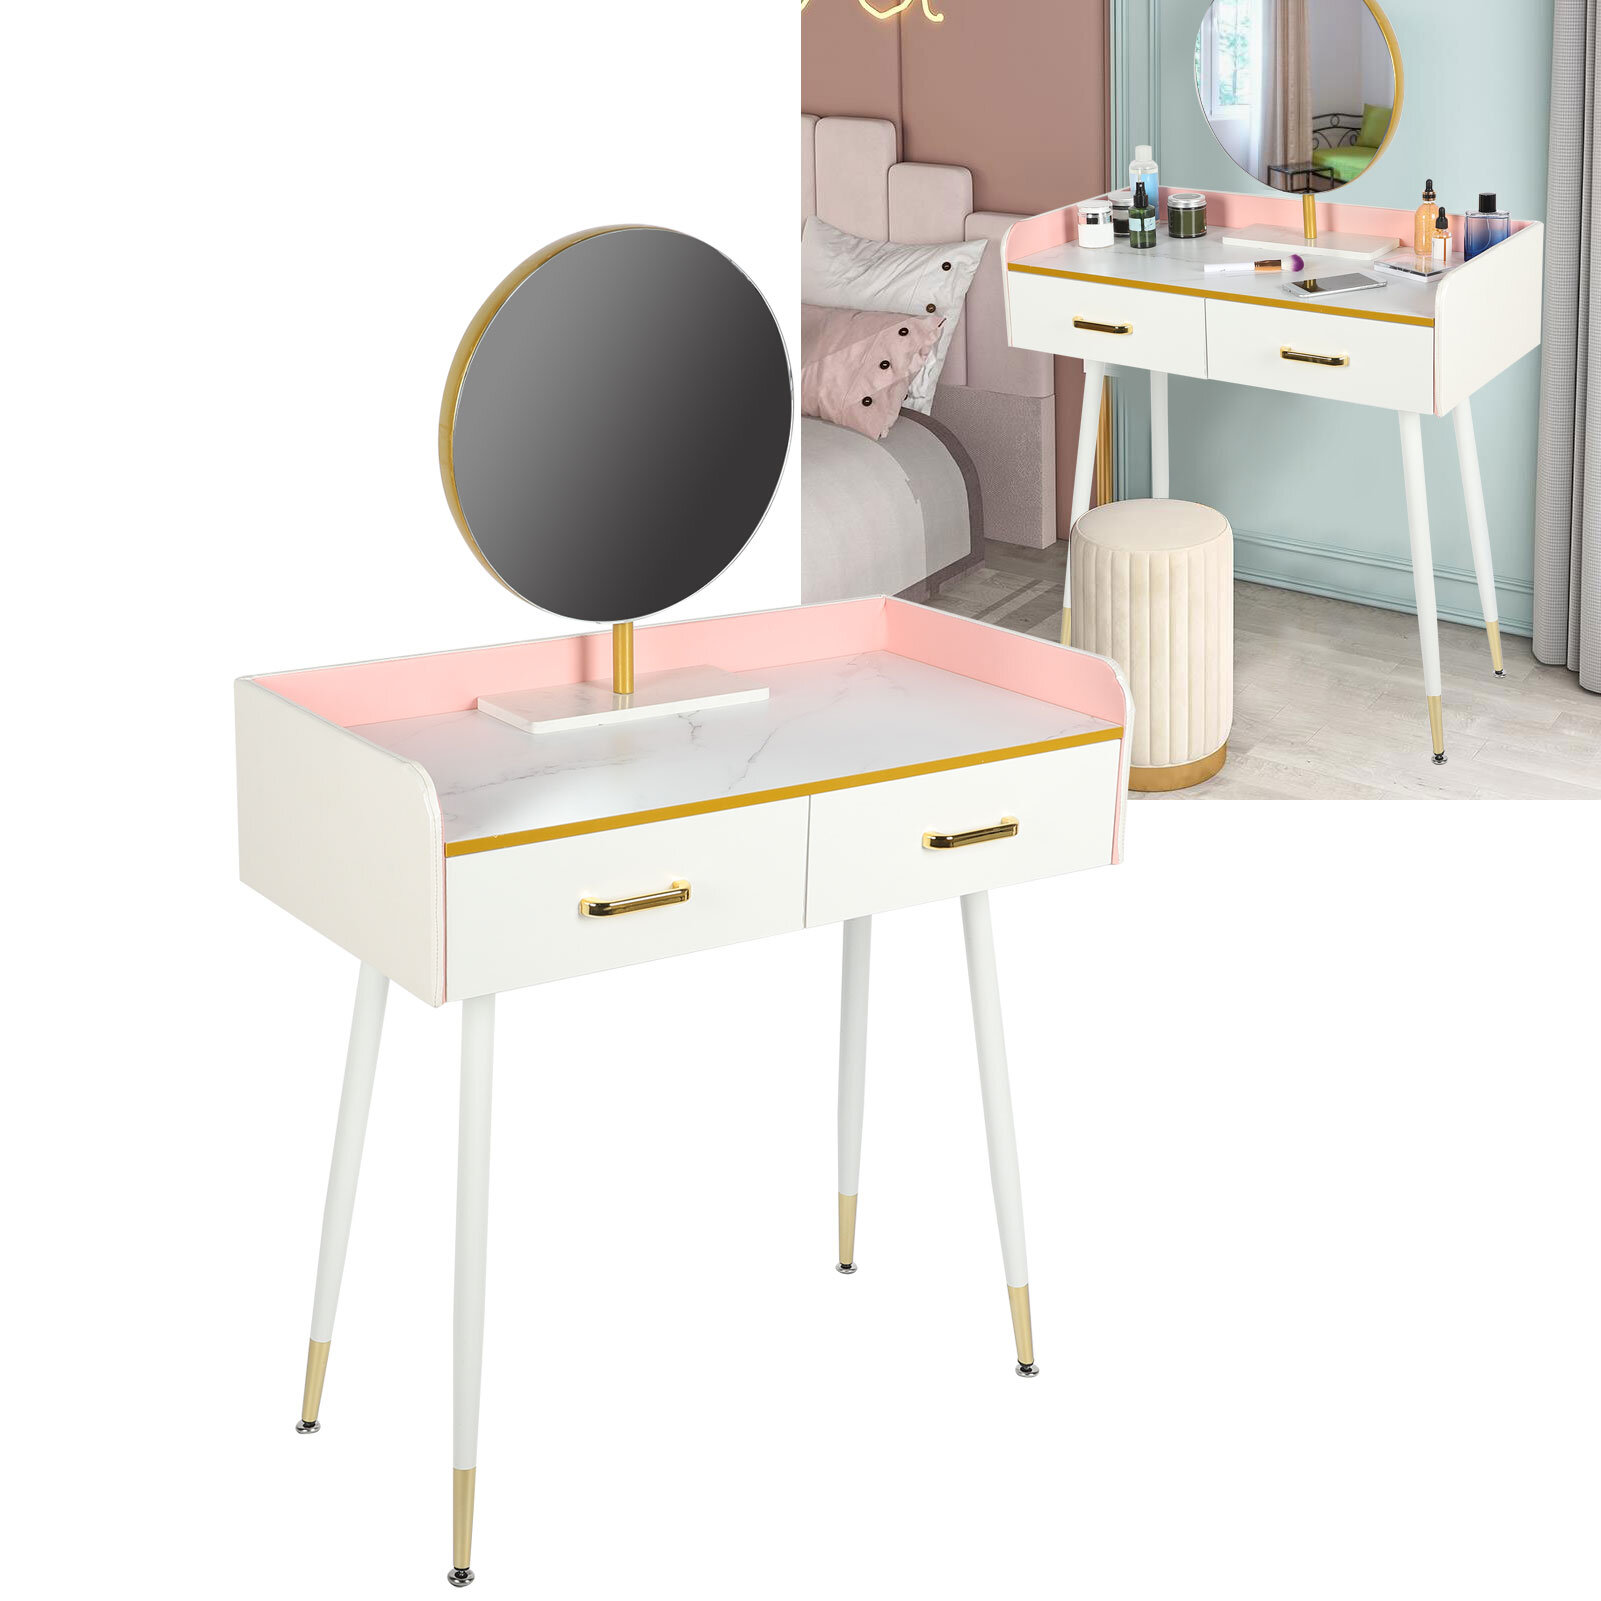 Mercer41 Makeup Vanity Table Set With Round Mirror, Dressing Desk